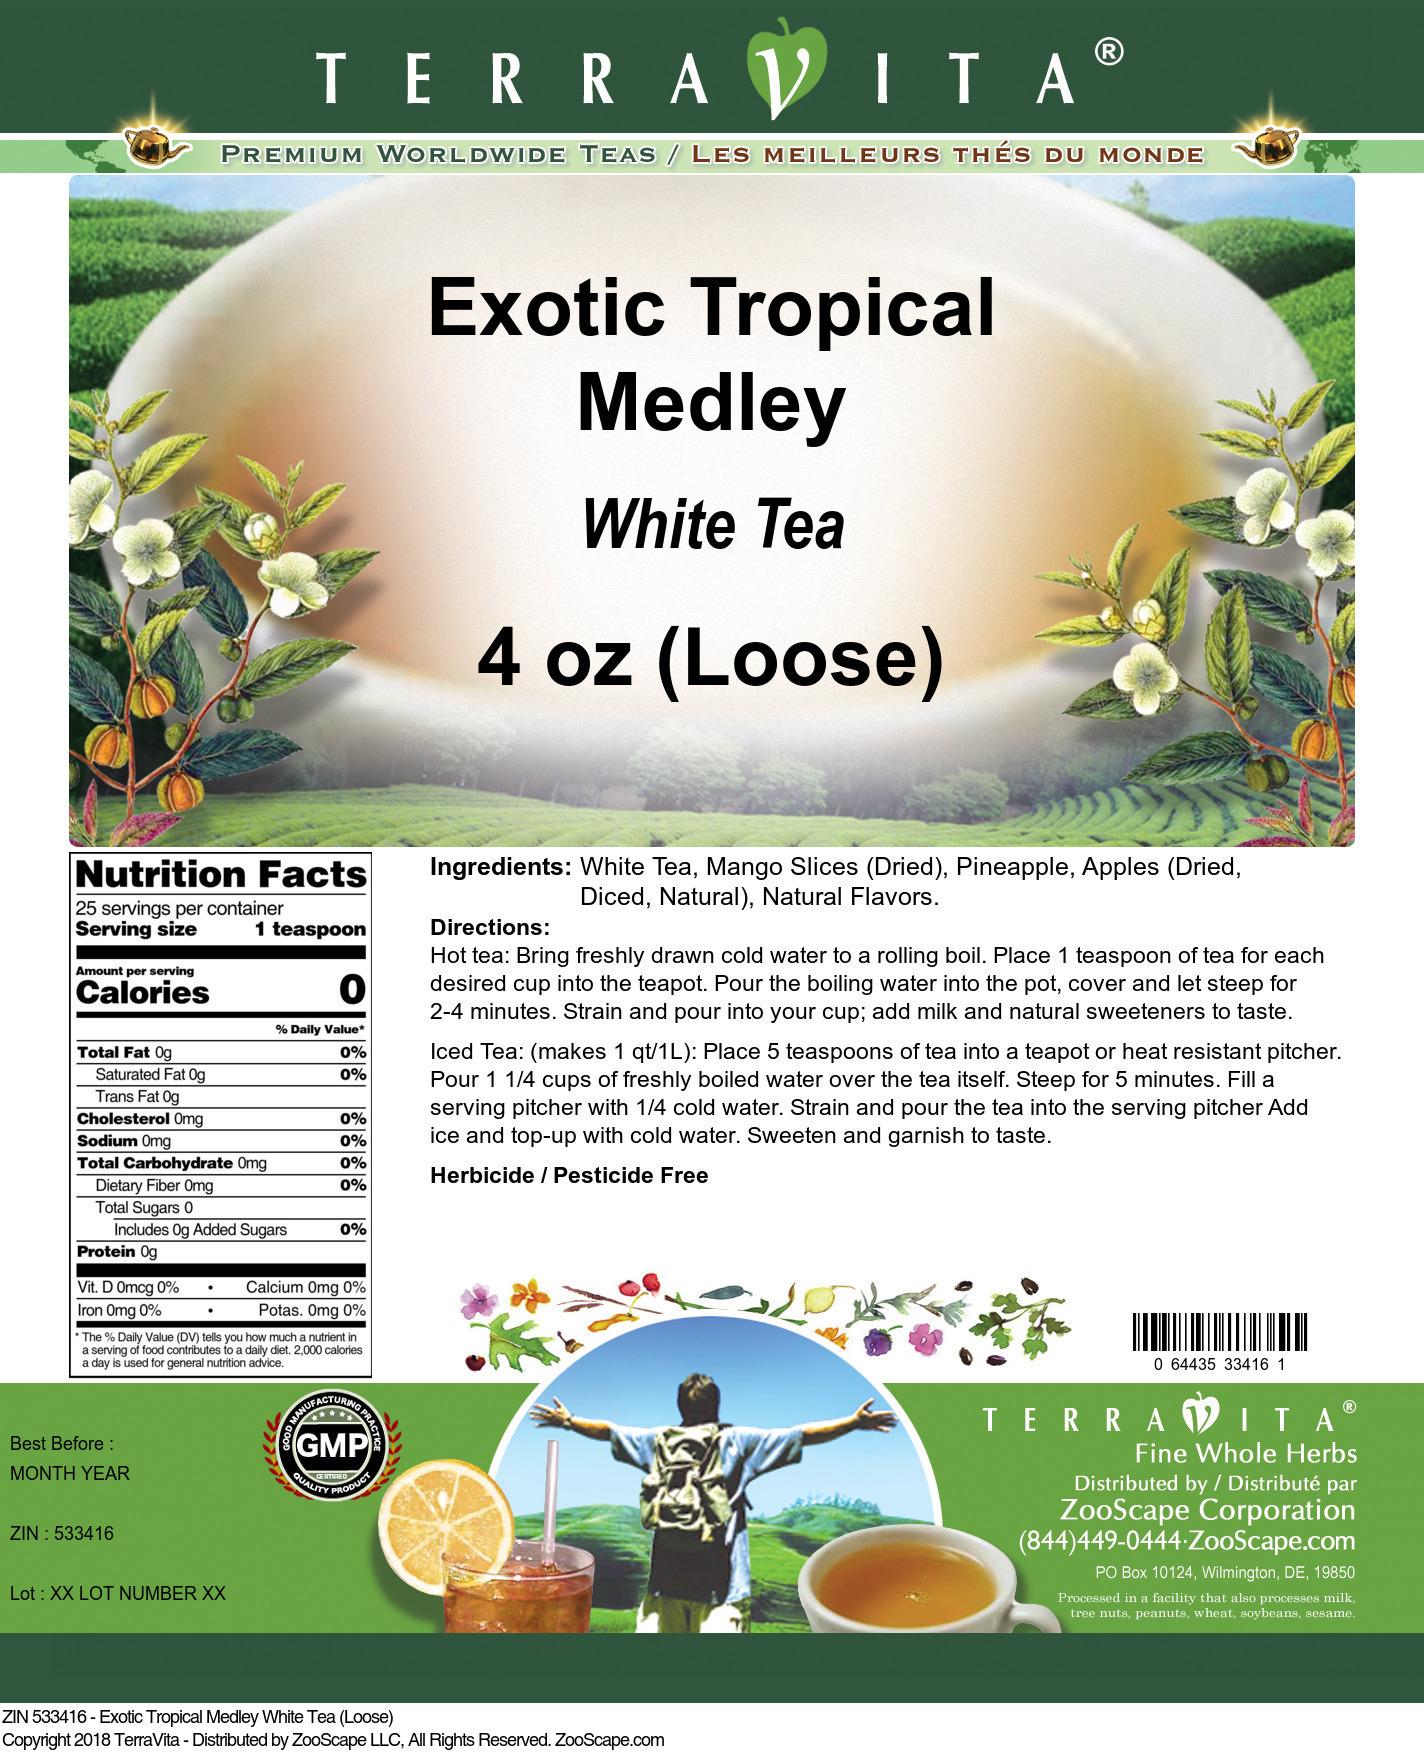 Exotic Tropical Medley White Tea (Loose)